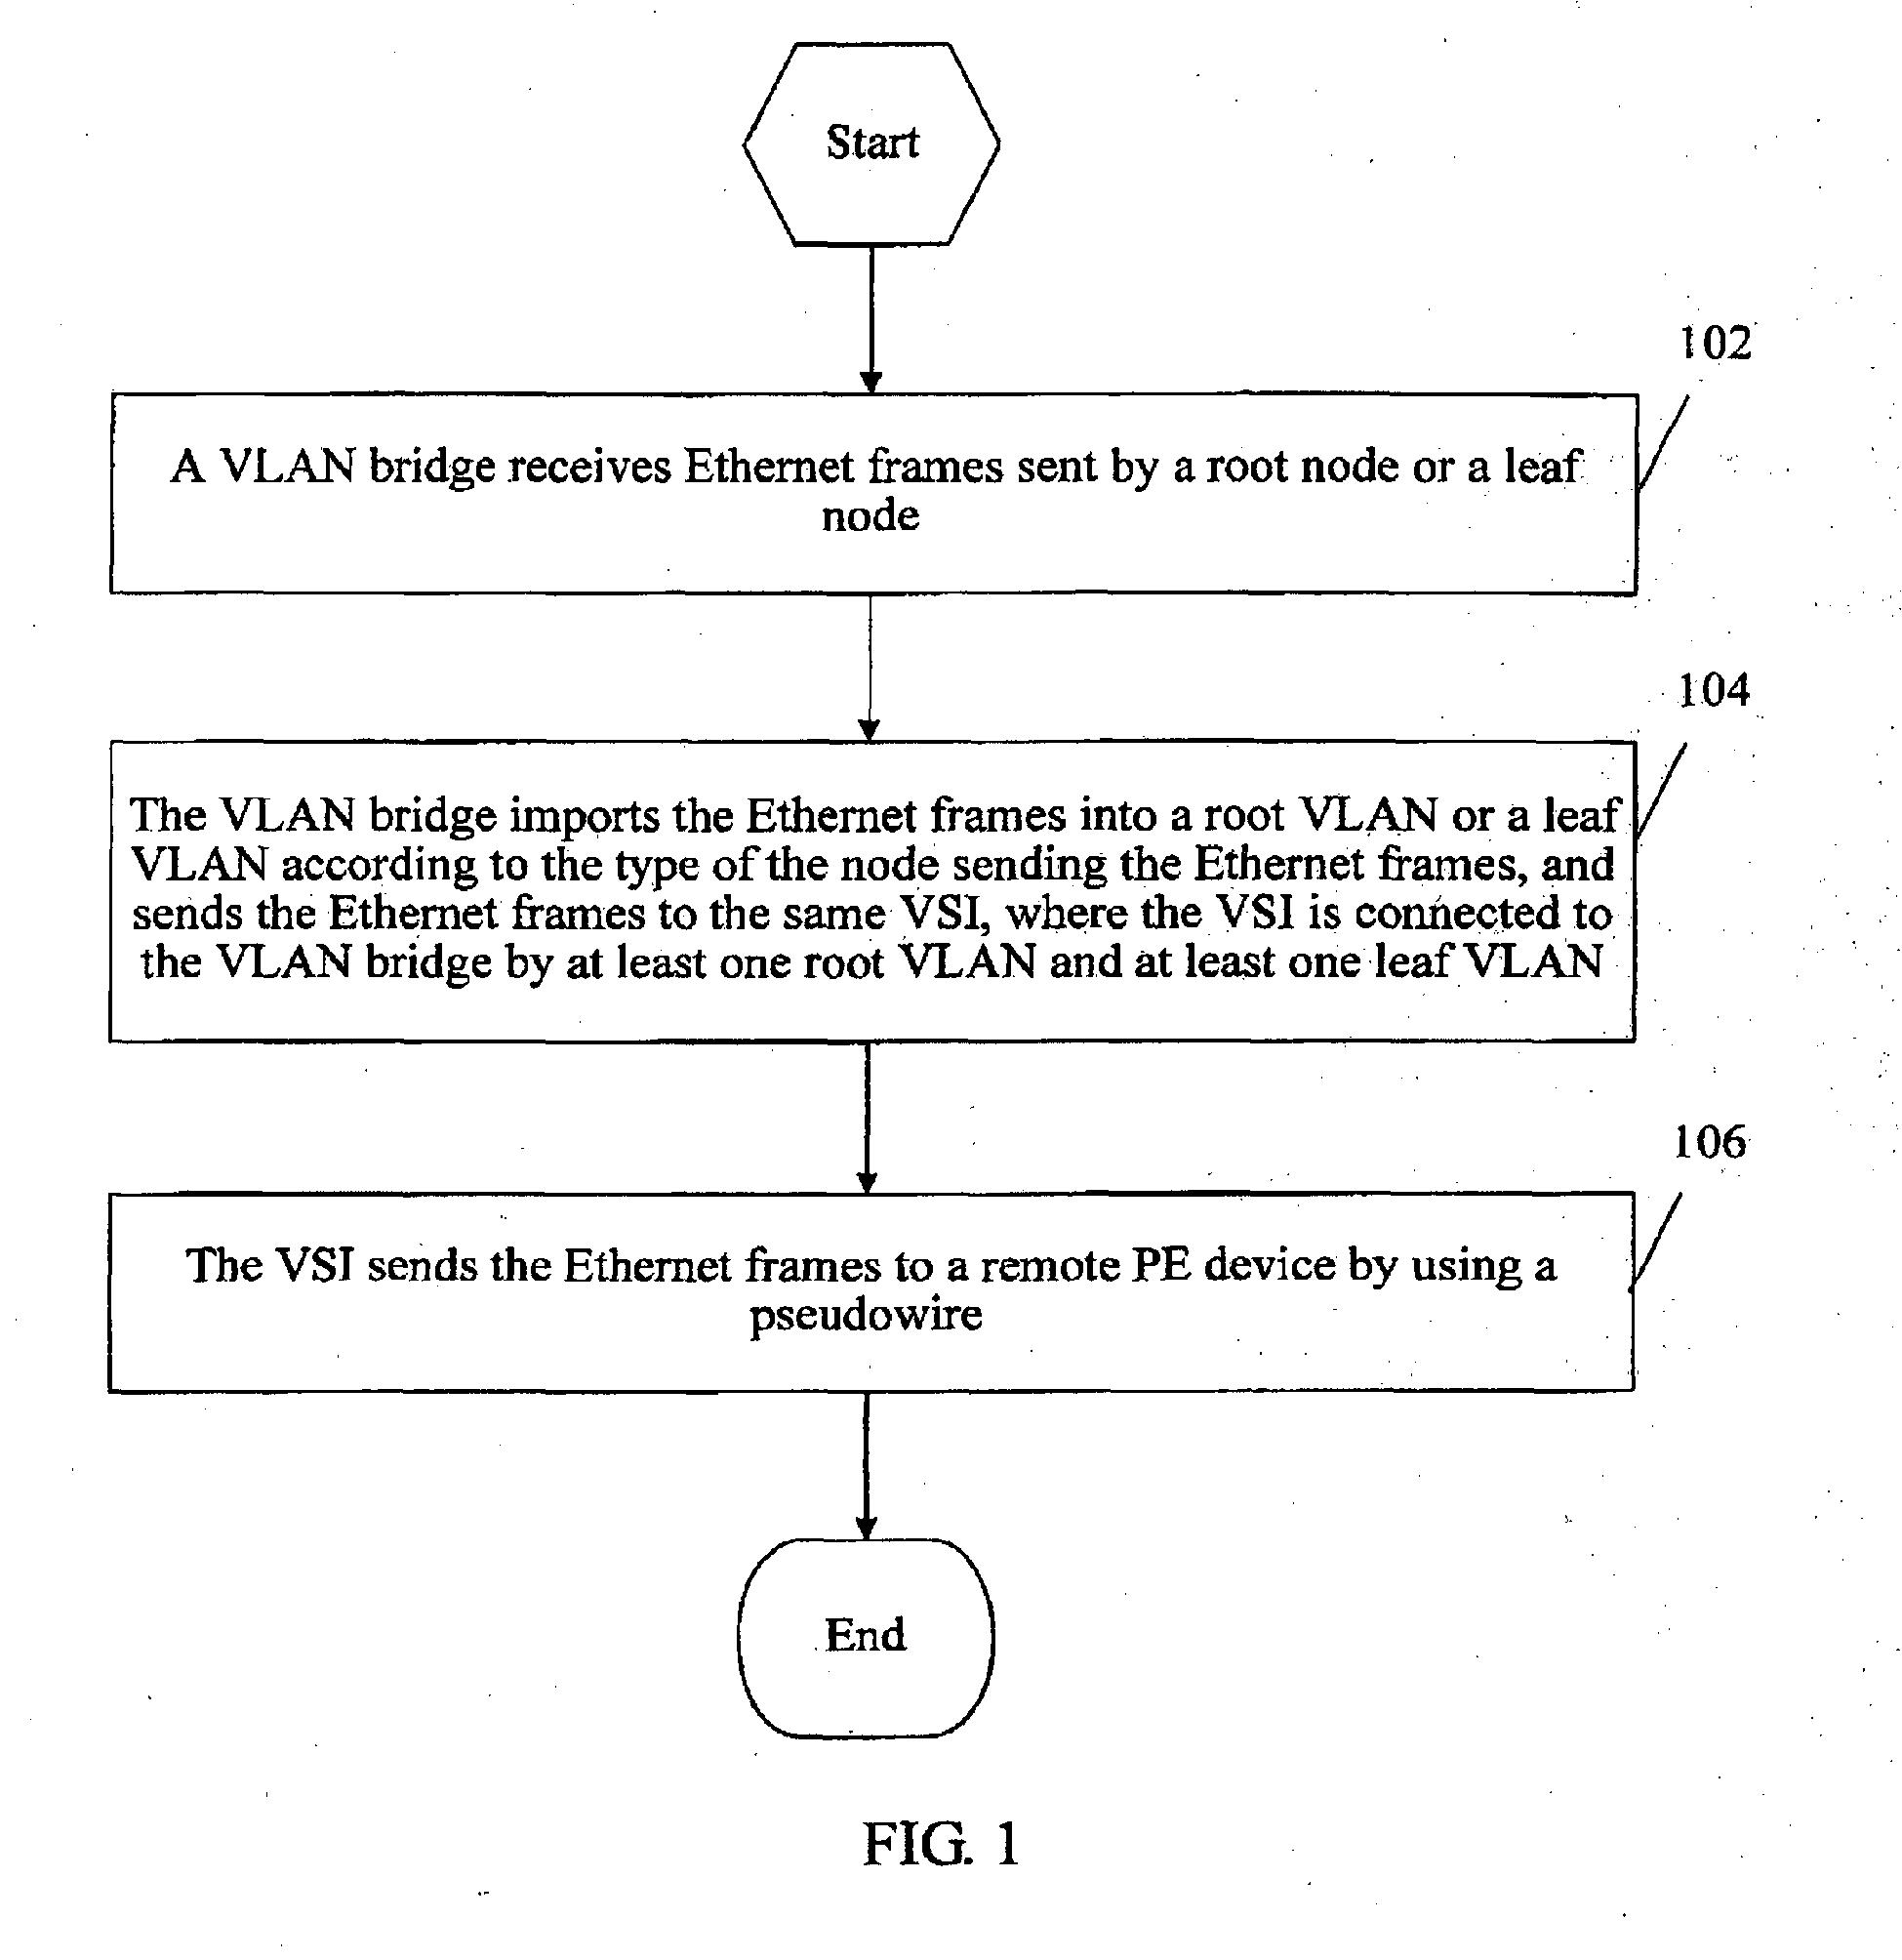 patent drawing - Ethernet Frames